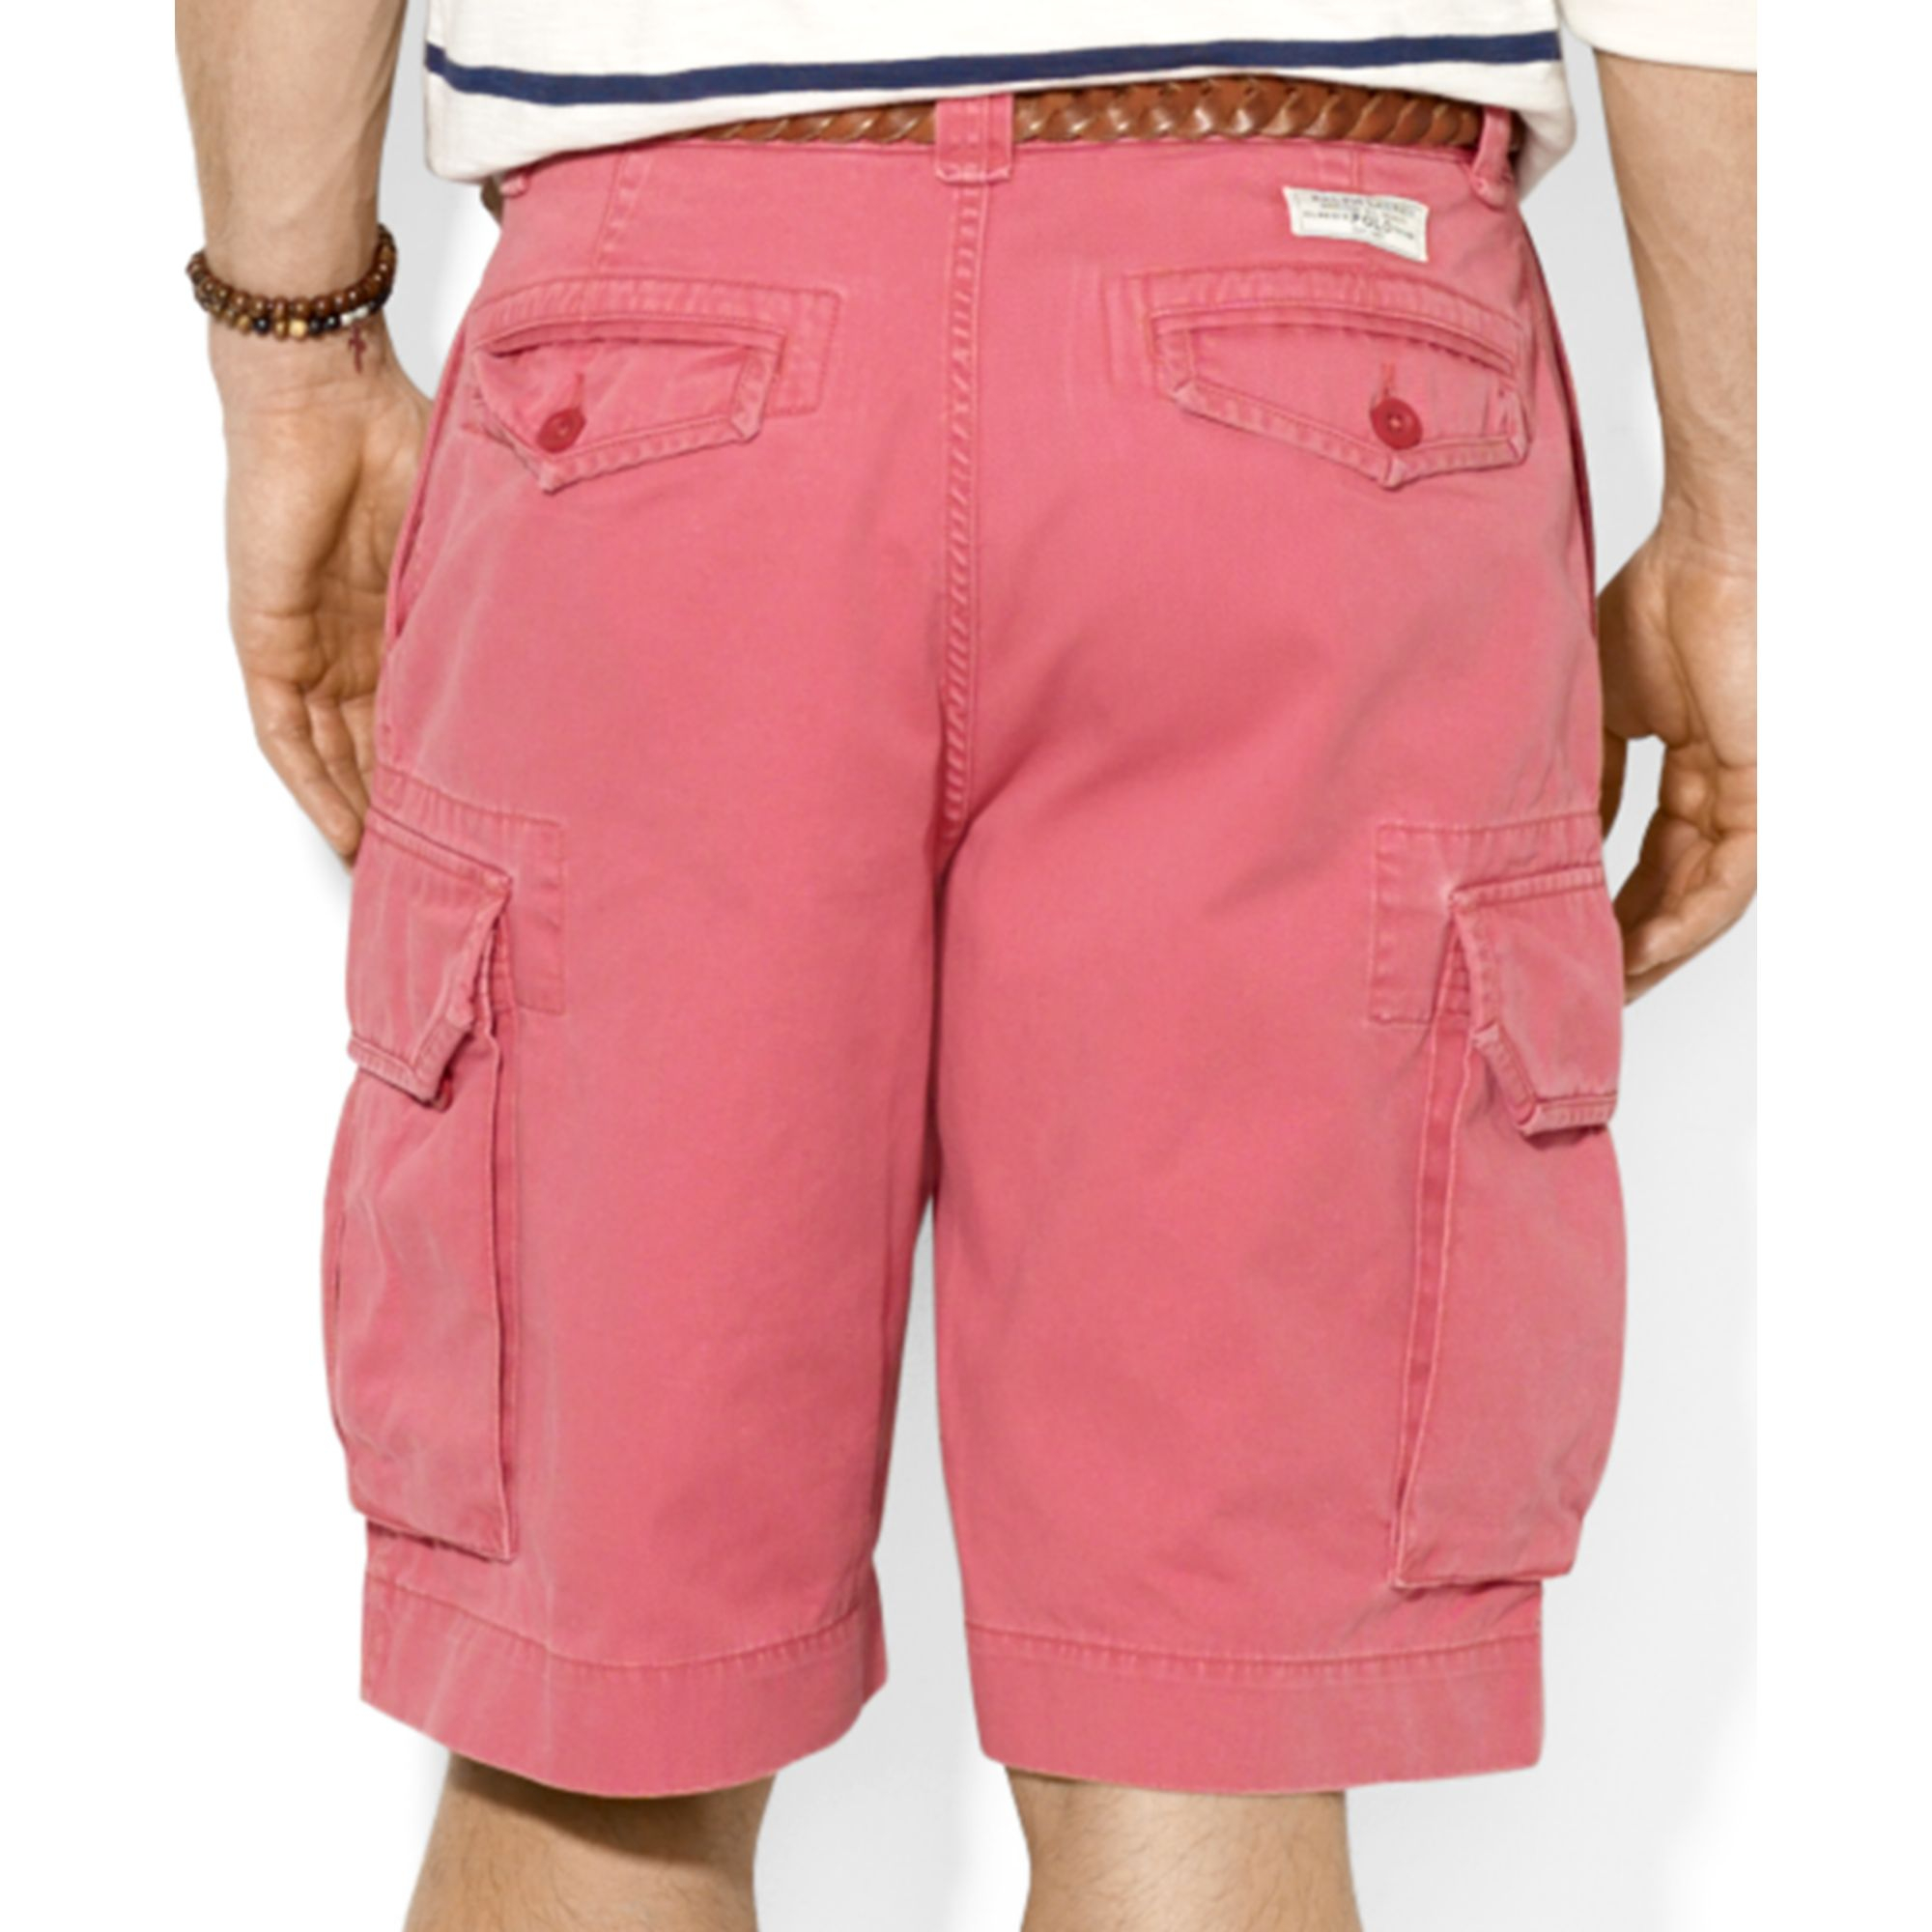 Company Jeans Ralph Mens Polo Lauren Cargo Shorts 29IEWDHYbe